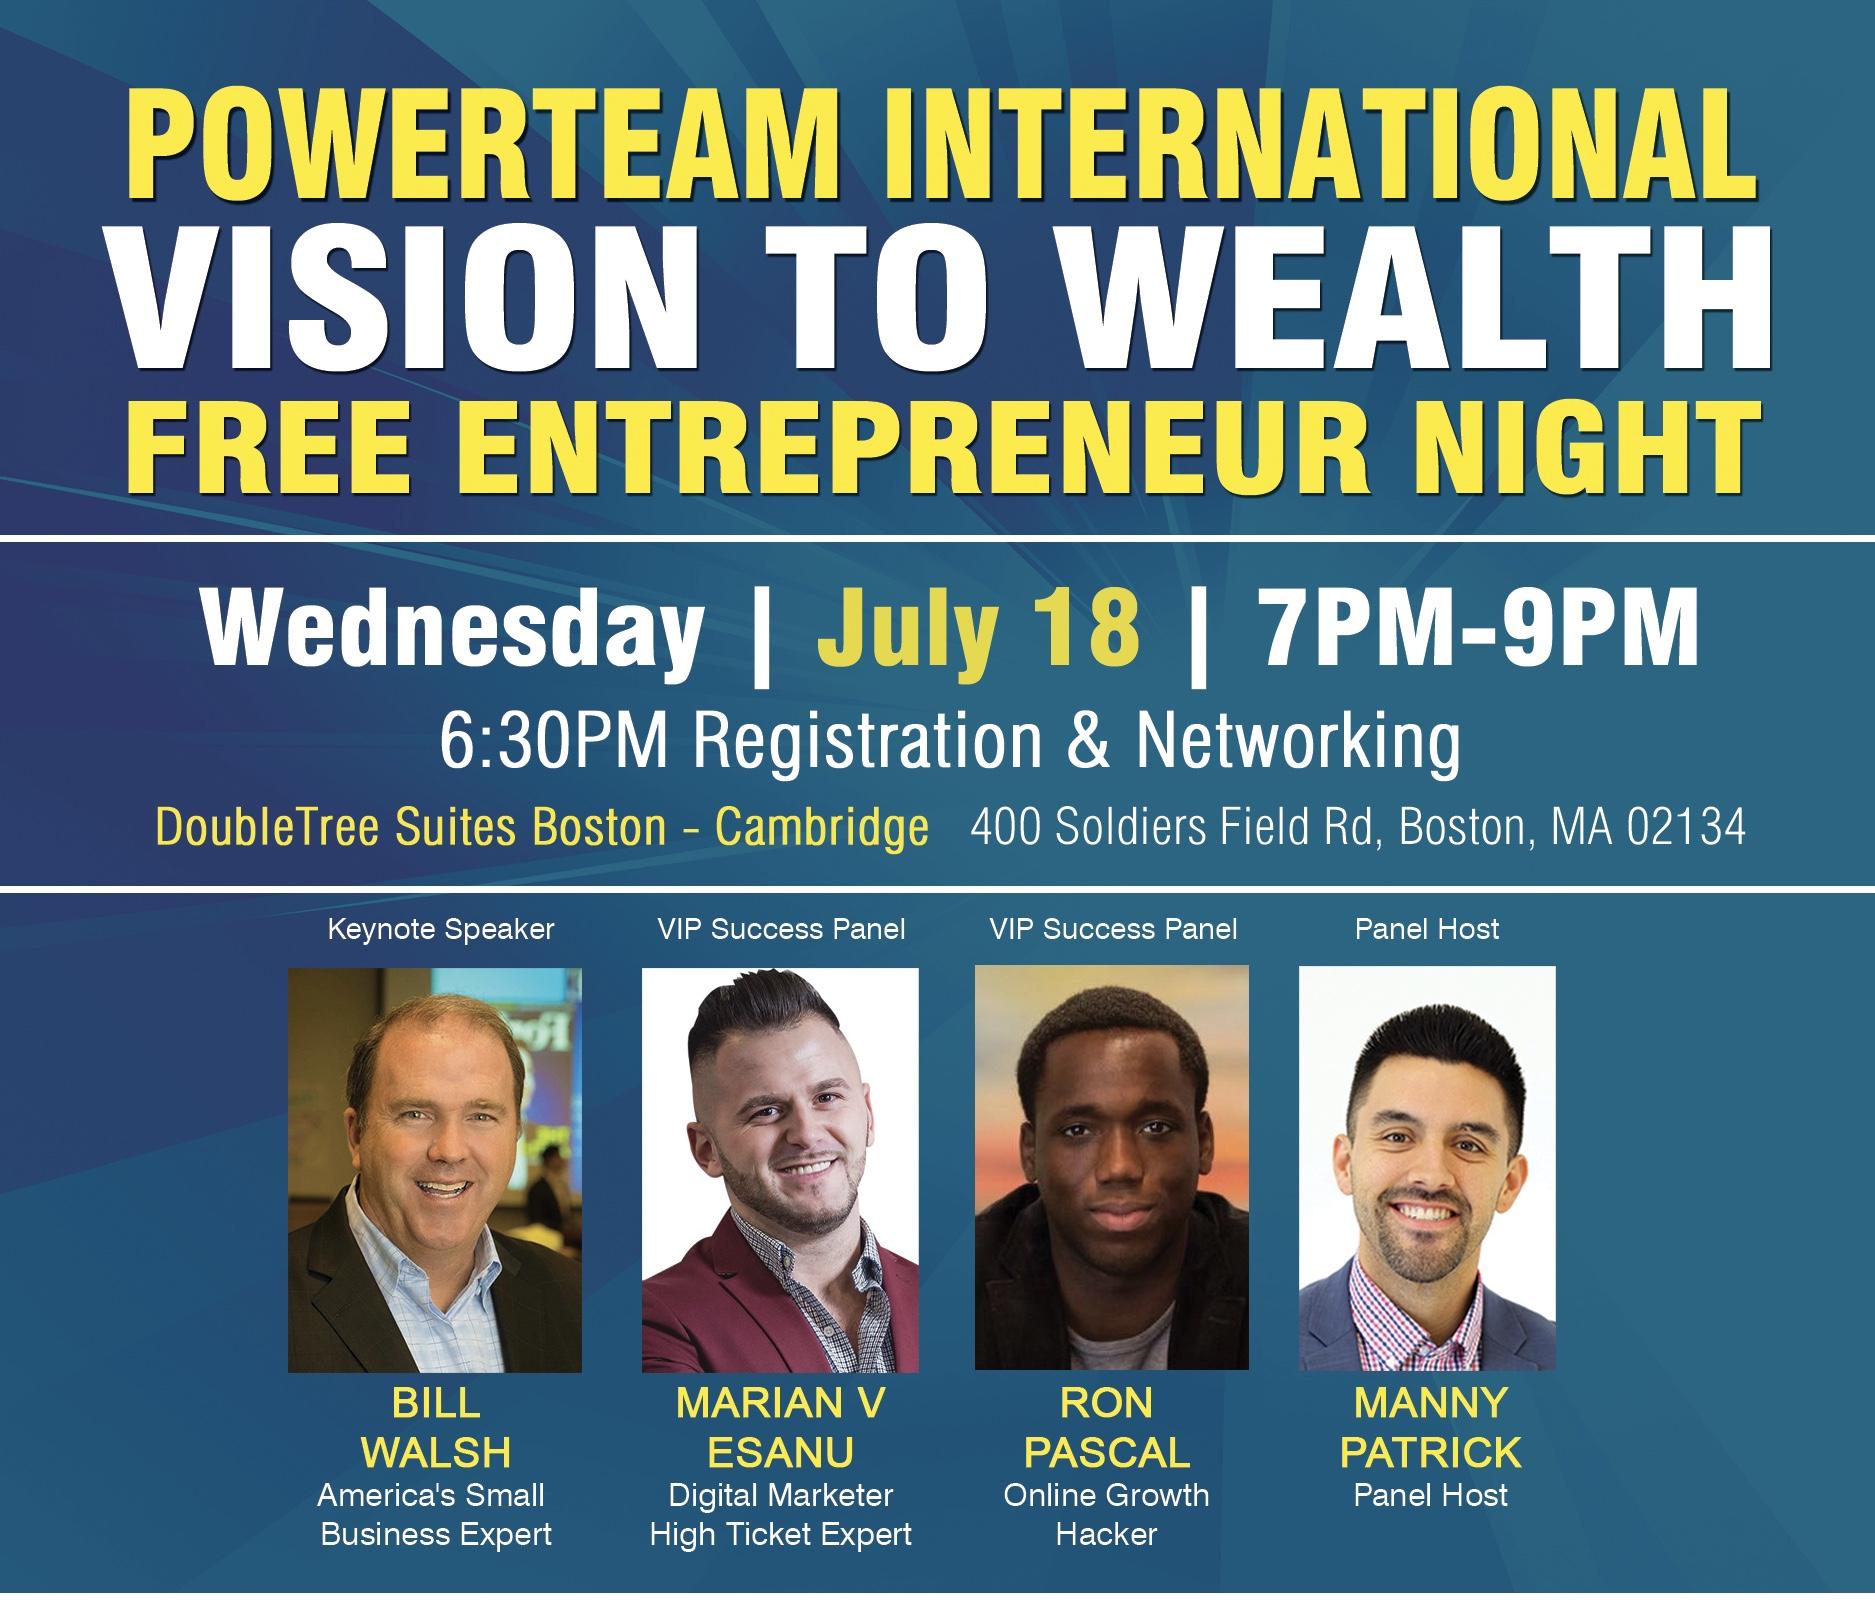 Vision to Wealth Boston - Nicole Taylor